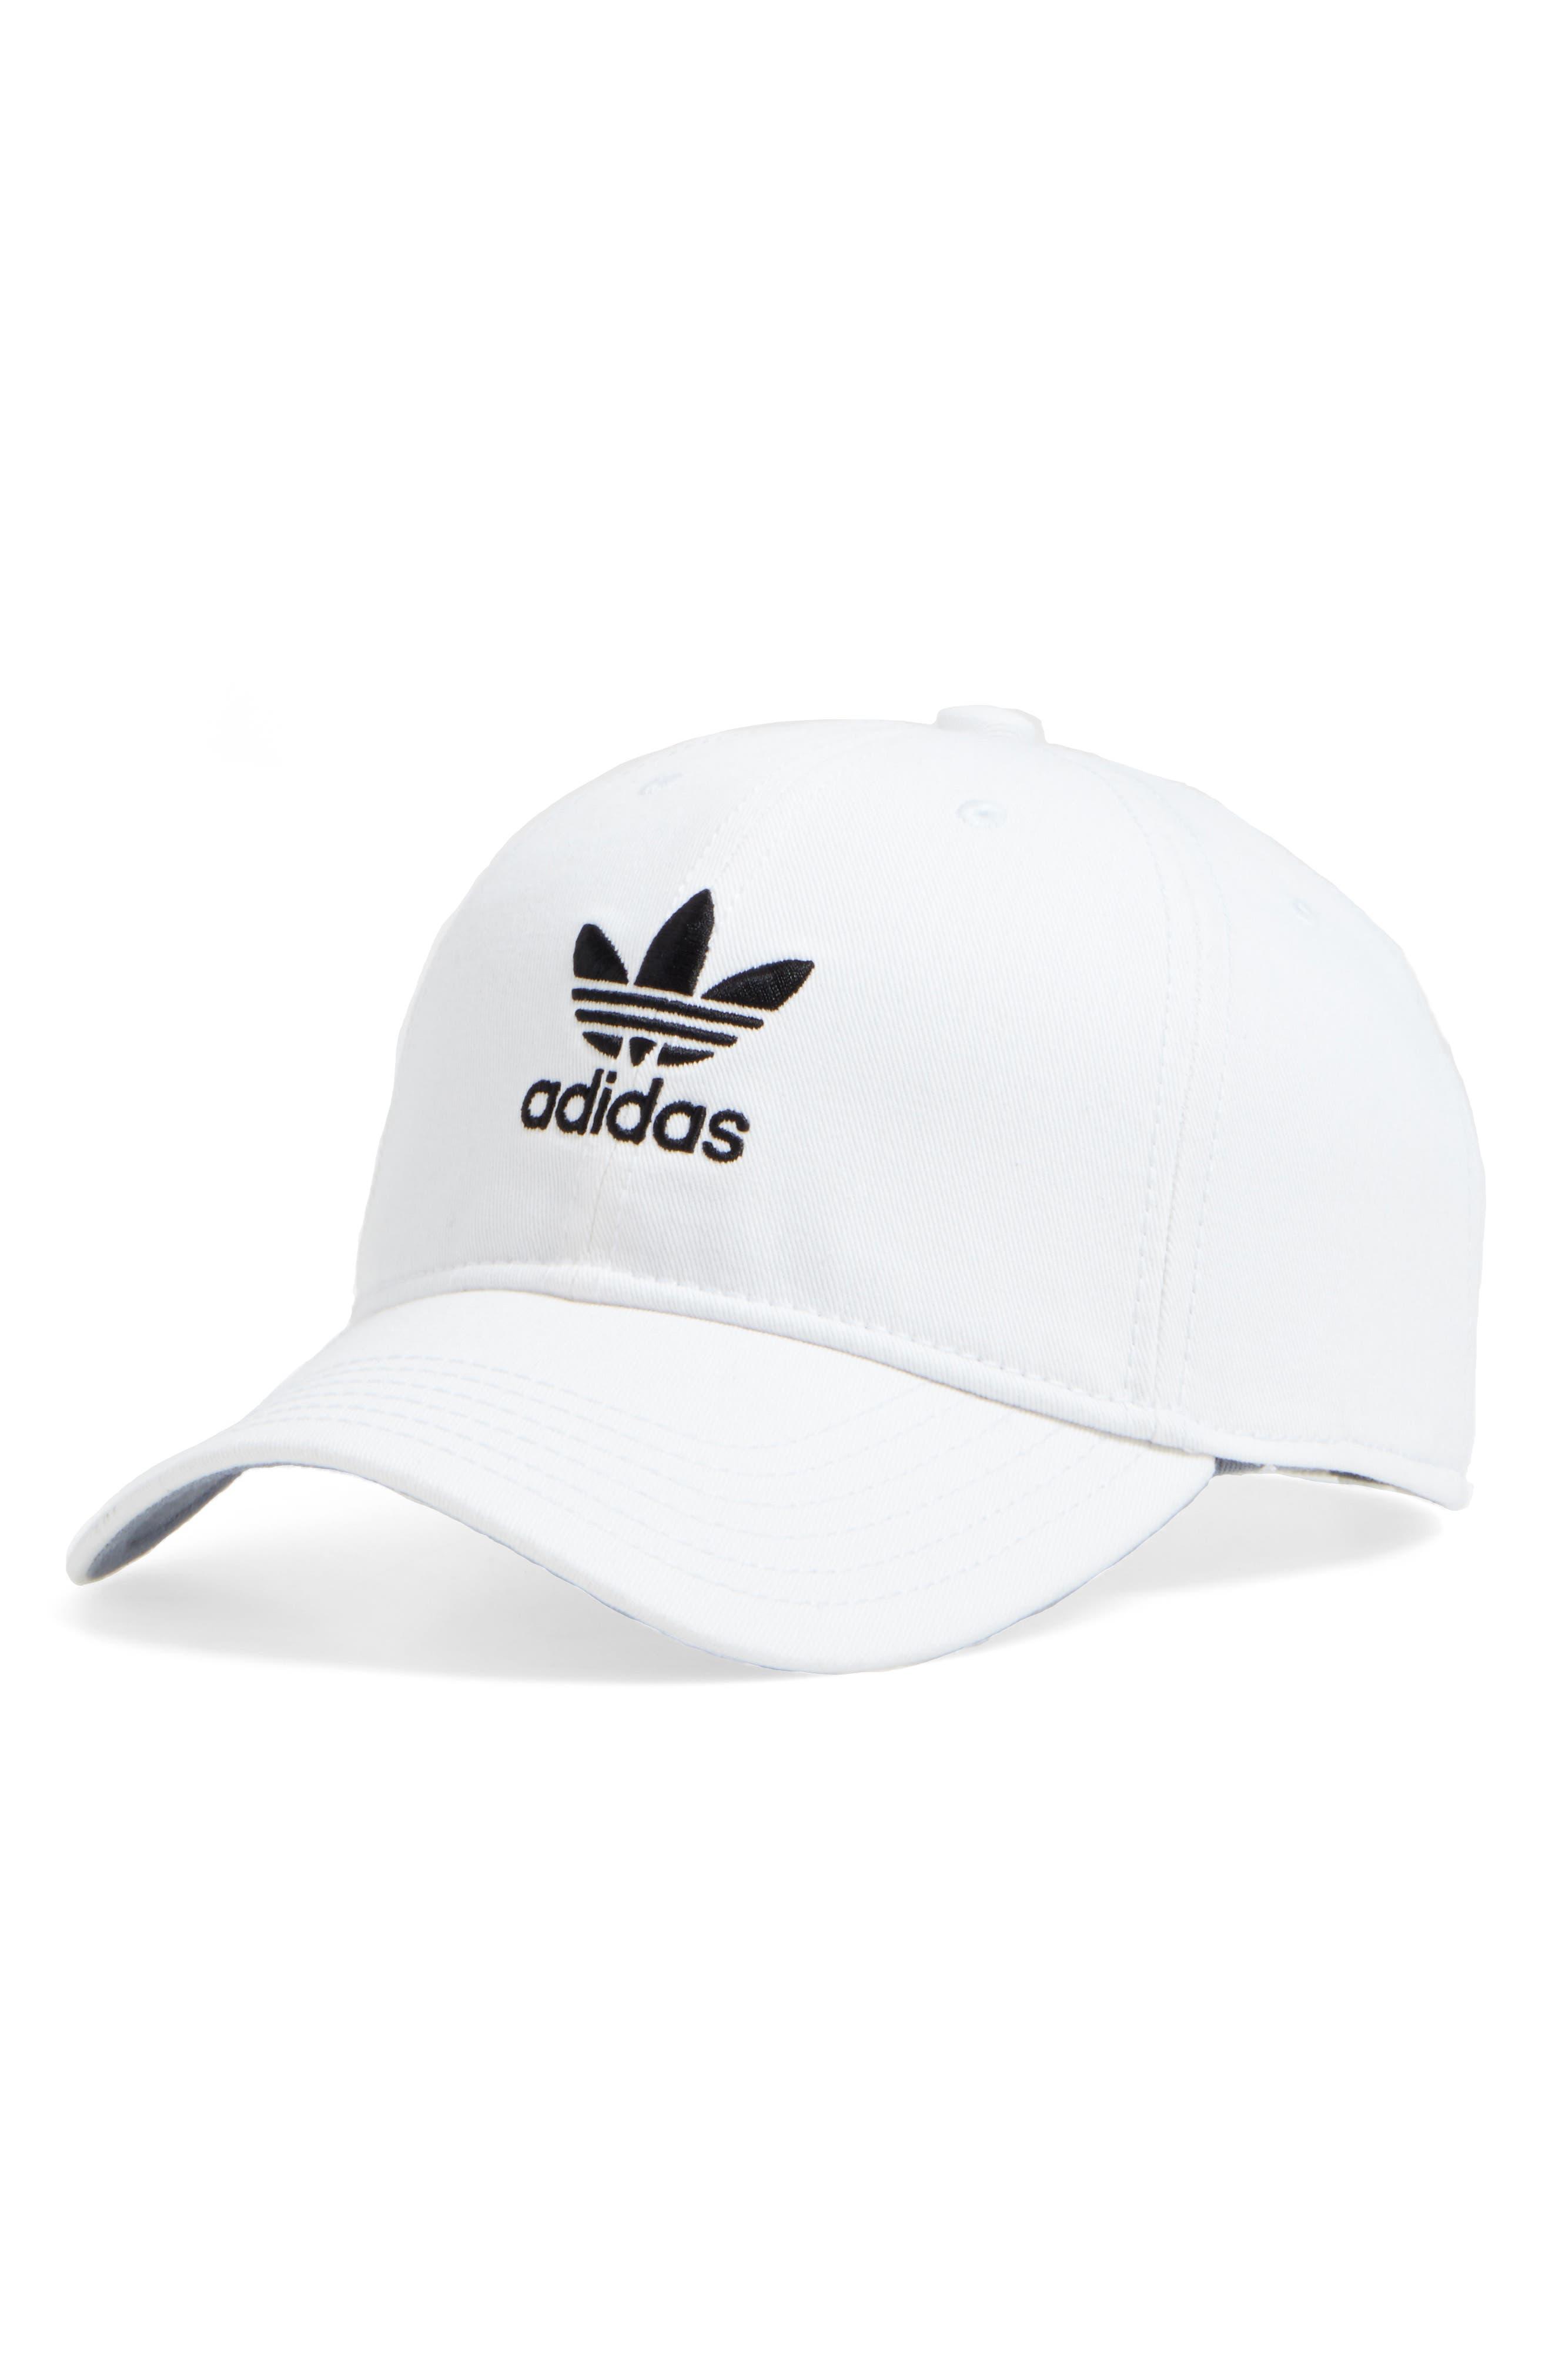 68722b6f5cb Adidas Hats for Women